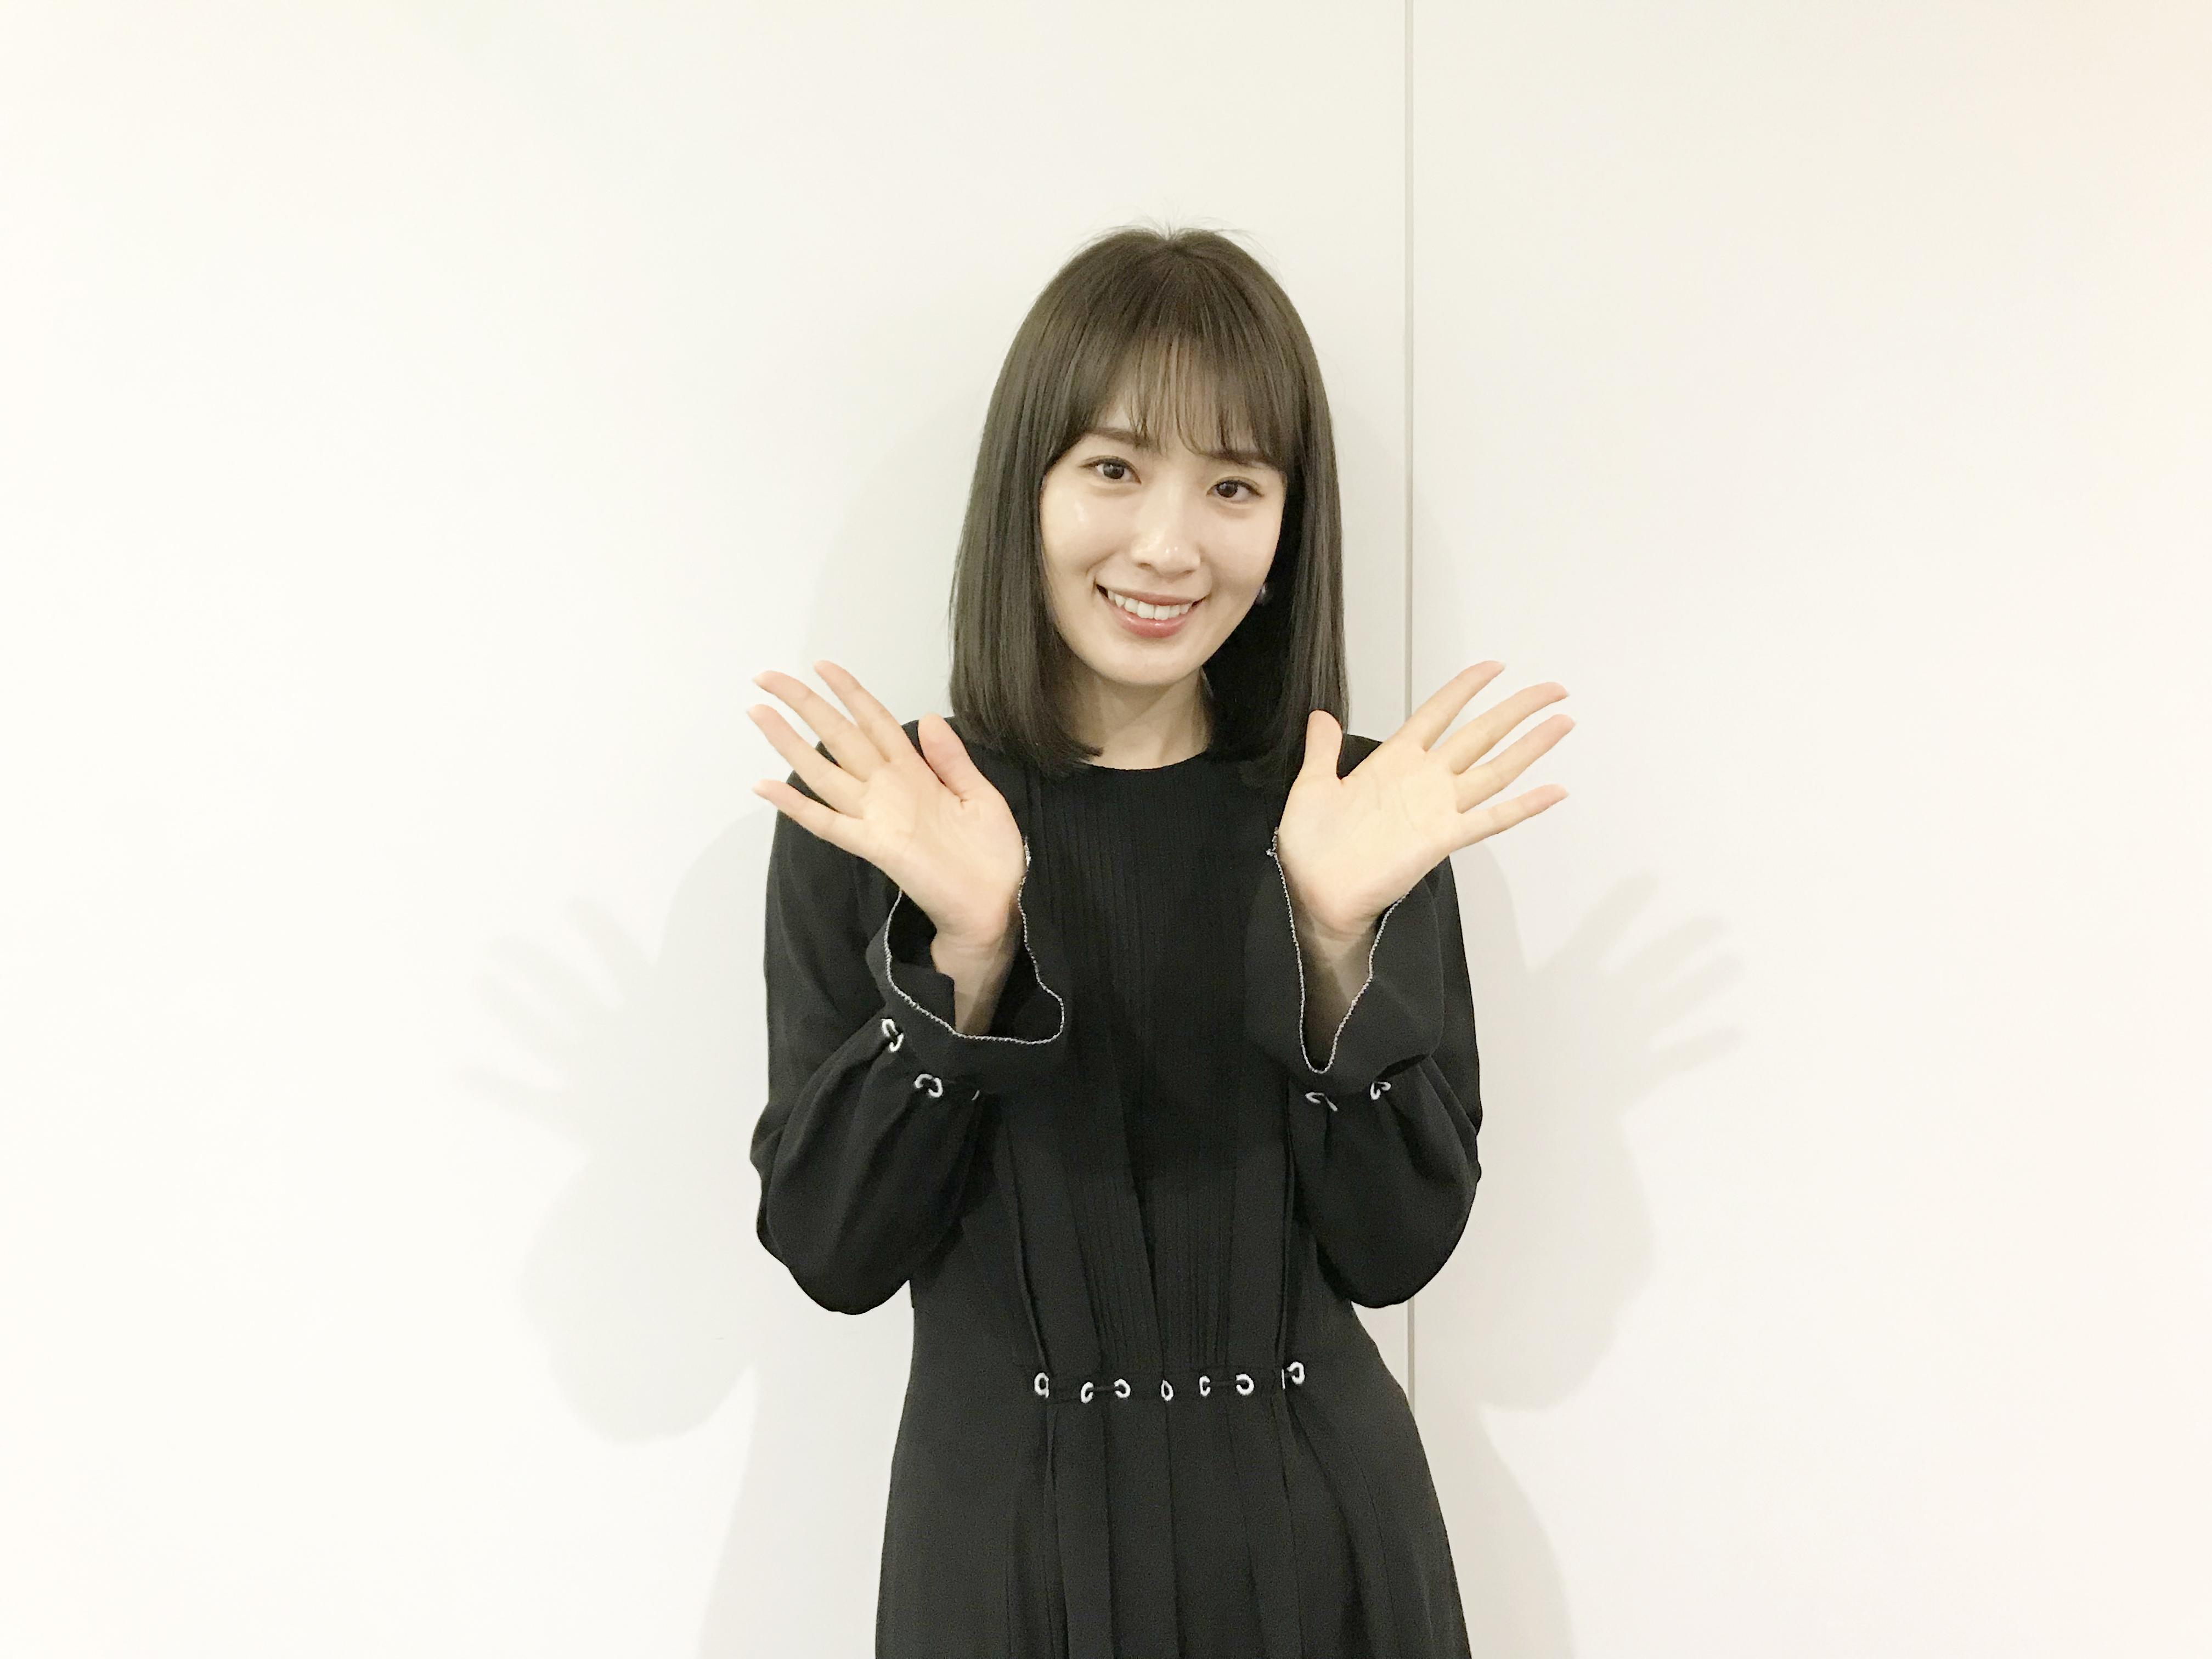 http://www.joqr.co.jp/nogizaka/takayama355.jpg